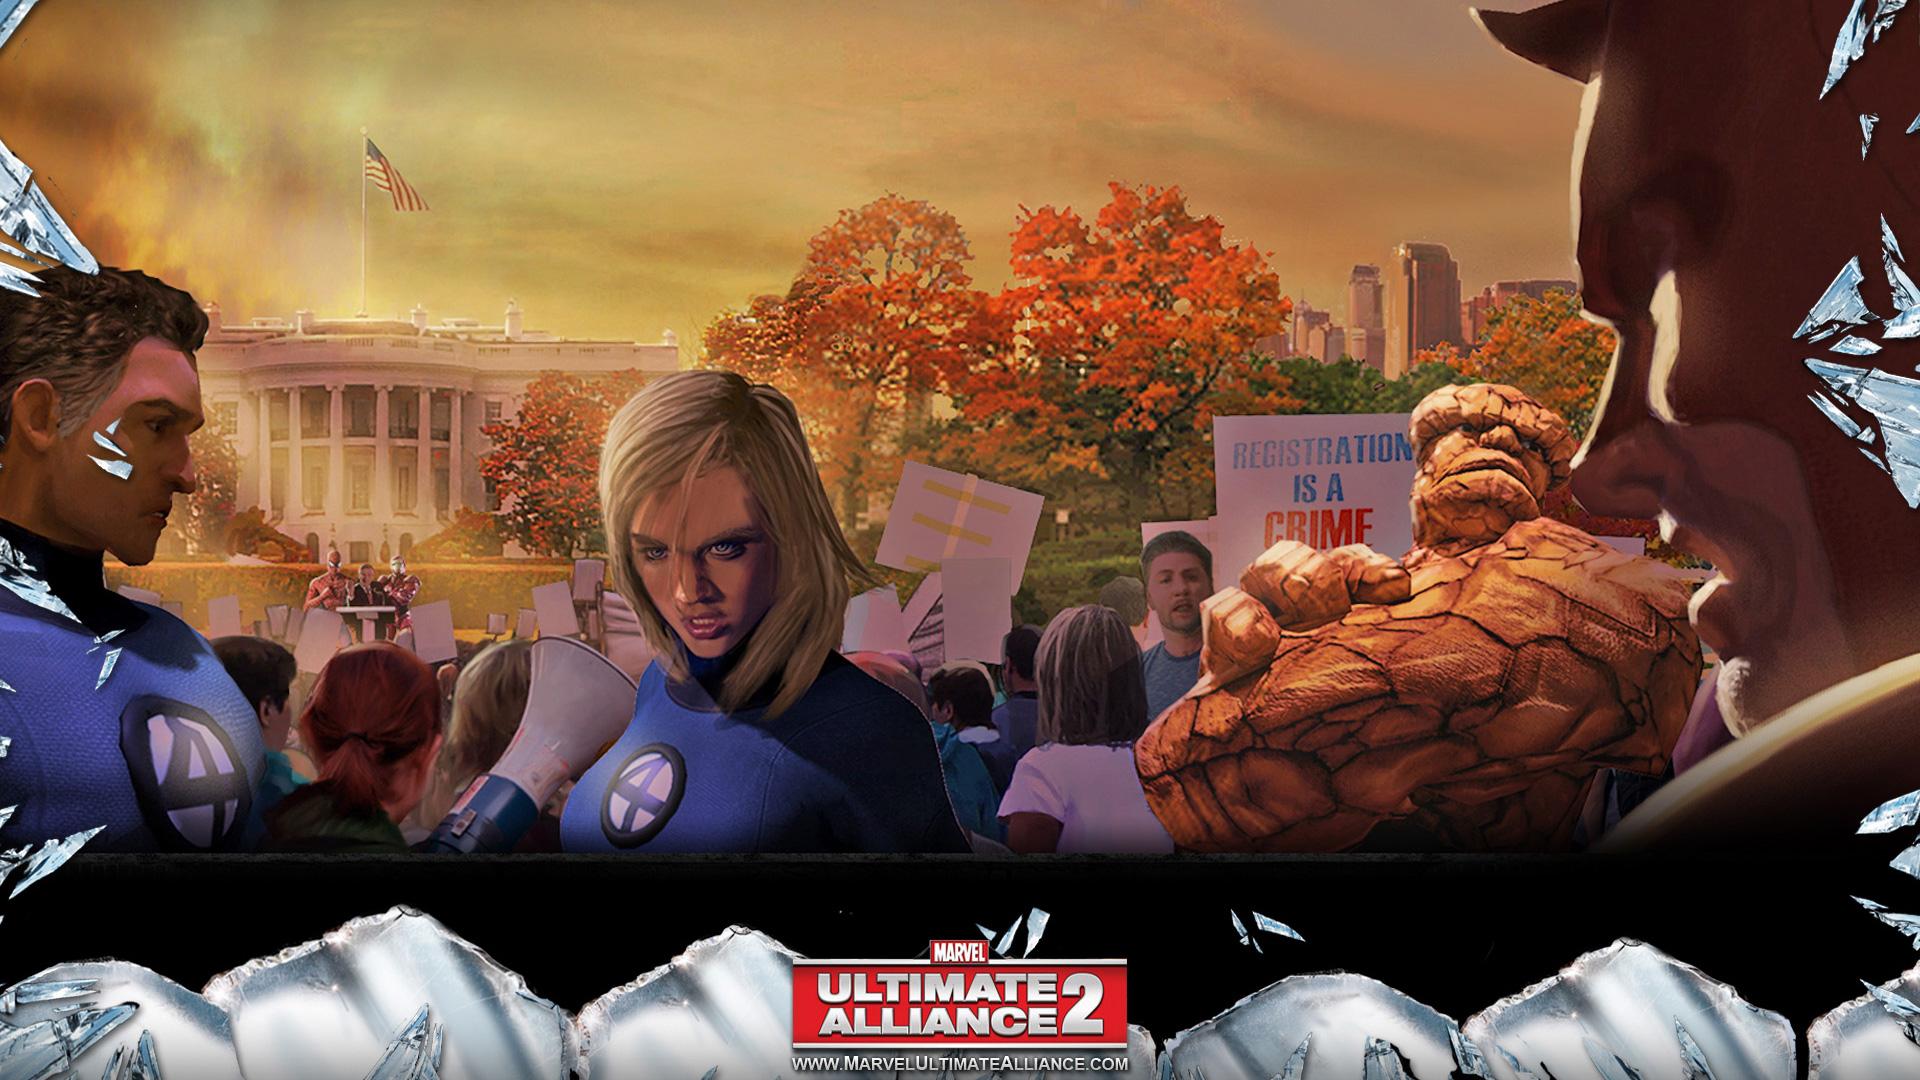 Free Marvel: Ultimate Alliance 2 Wallpaper in 1920x1080